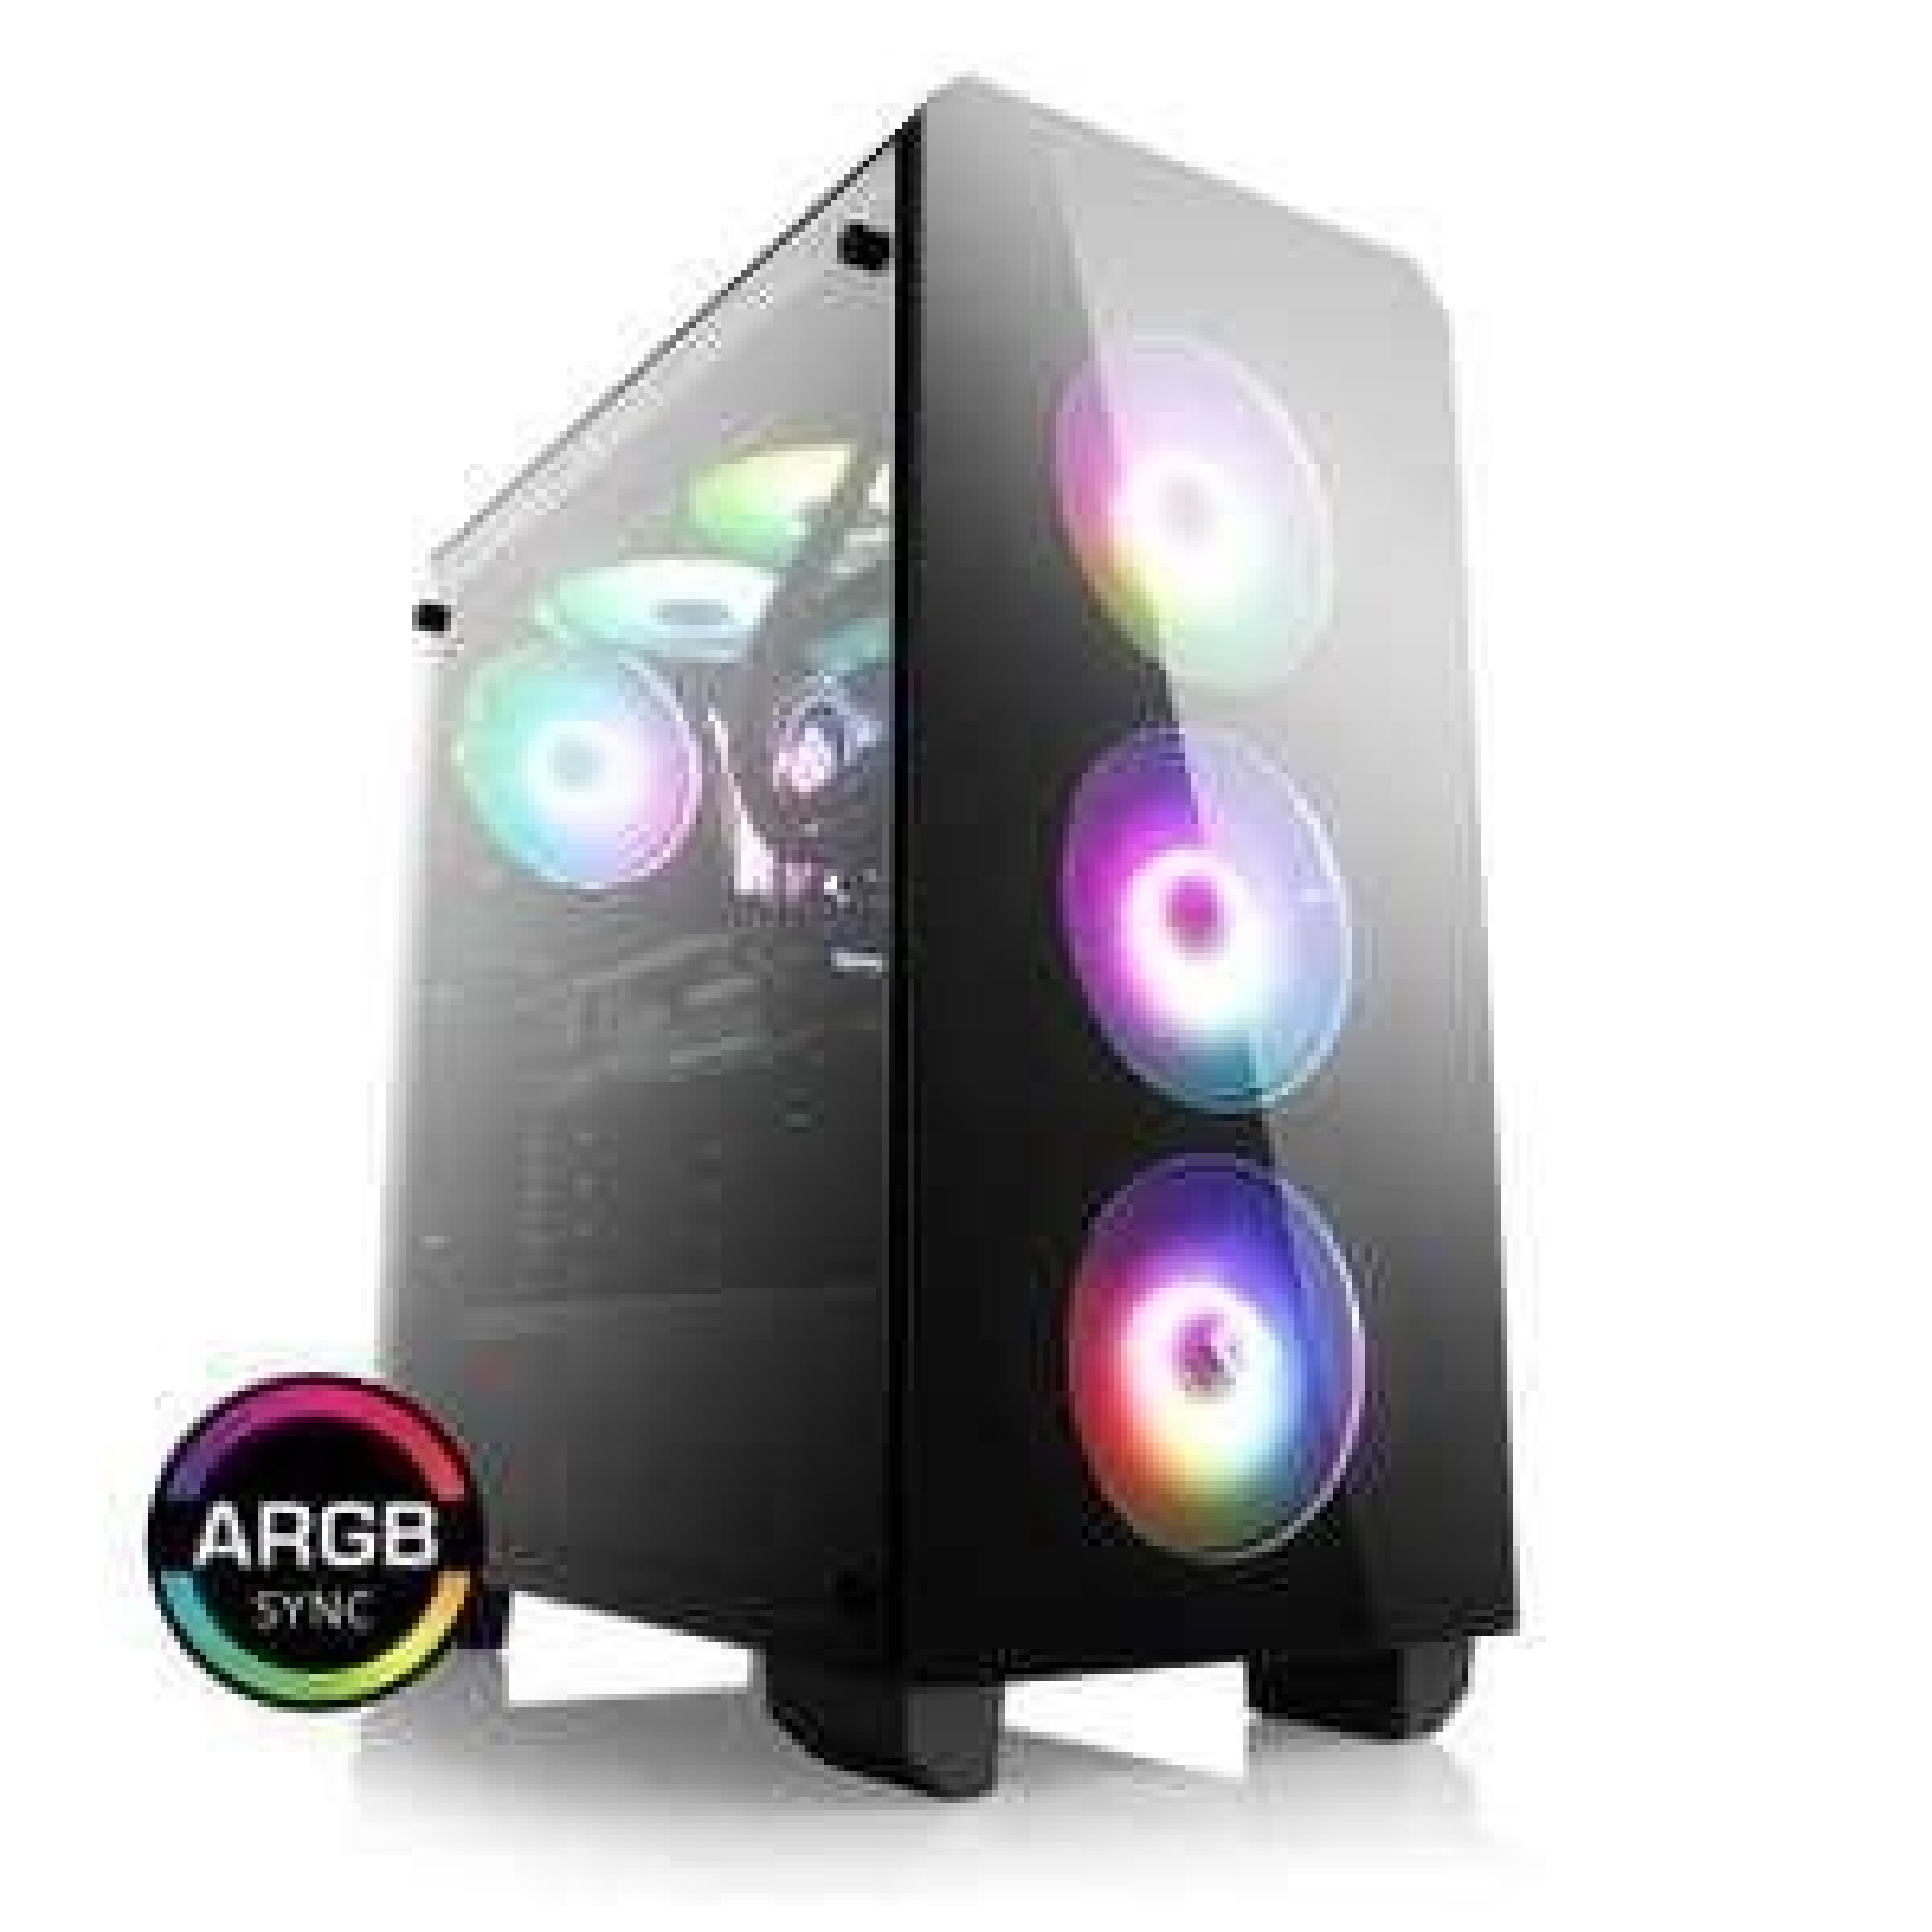 Tour PC Fixe Gamer - Ryzen 5 3600, RTX 2070 Super OC 8Go, RAM 16Go 3000Mhz, SSD 500Go, Alimentation Be Quiet! 600W